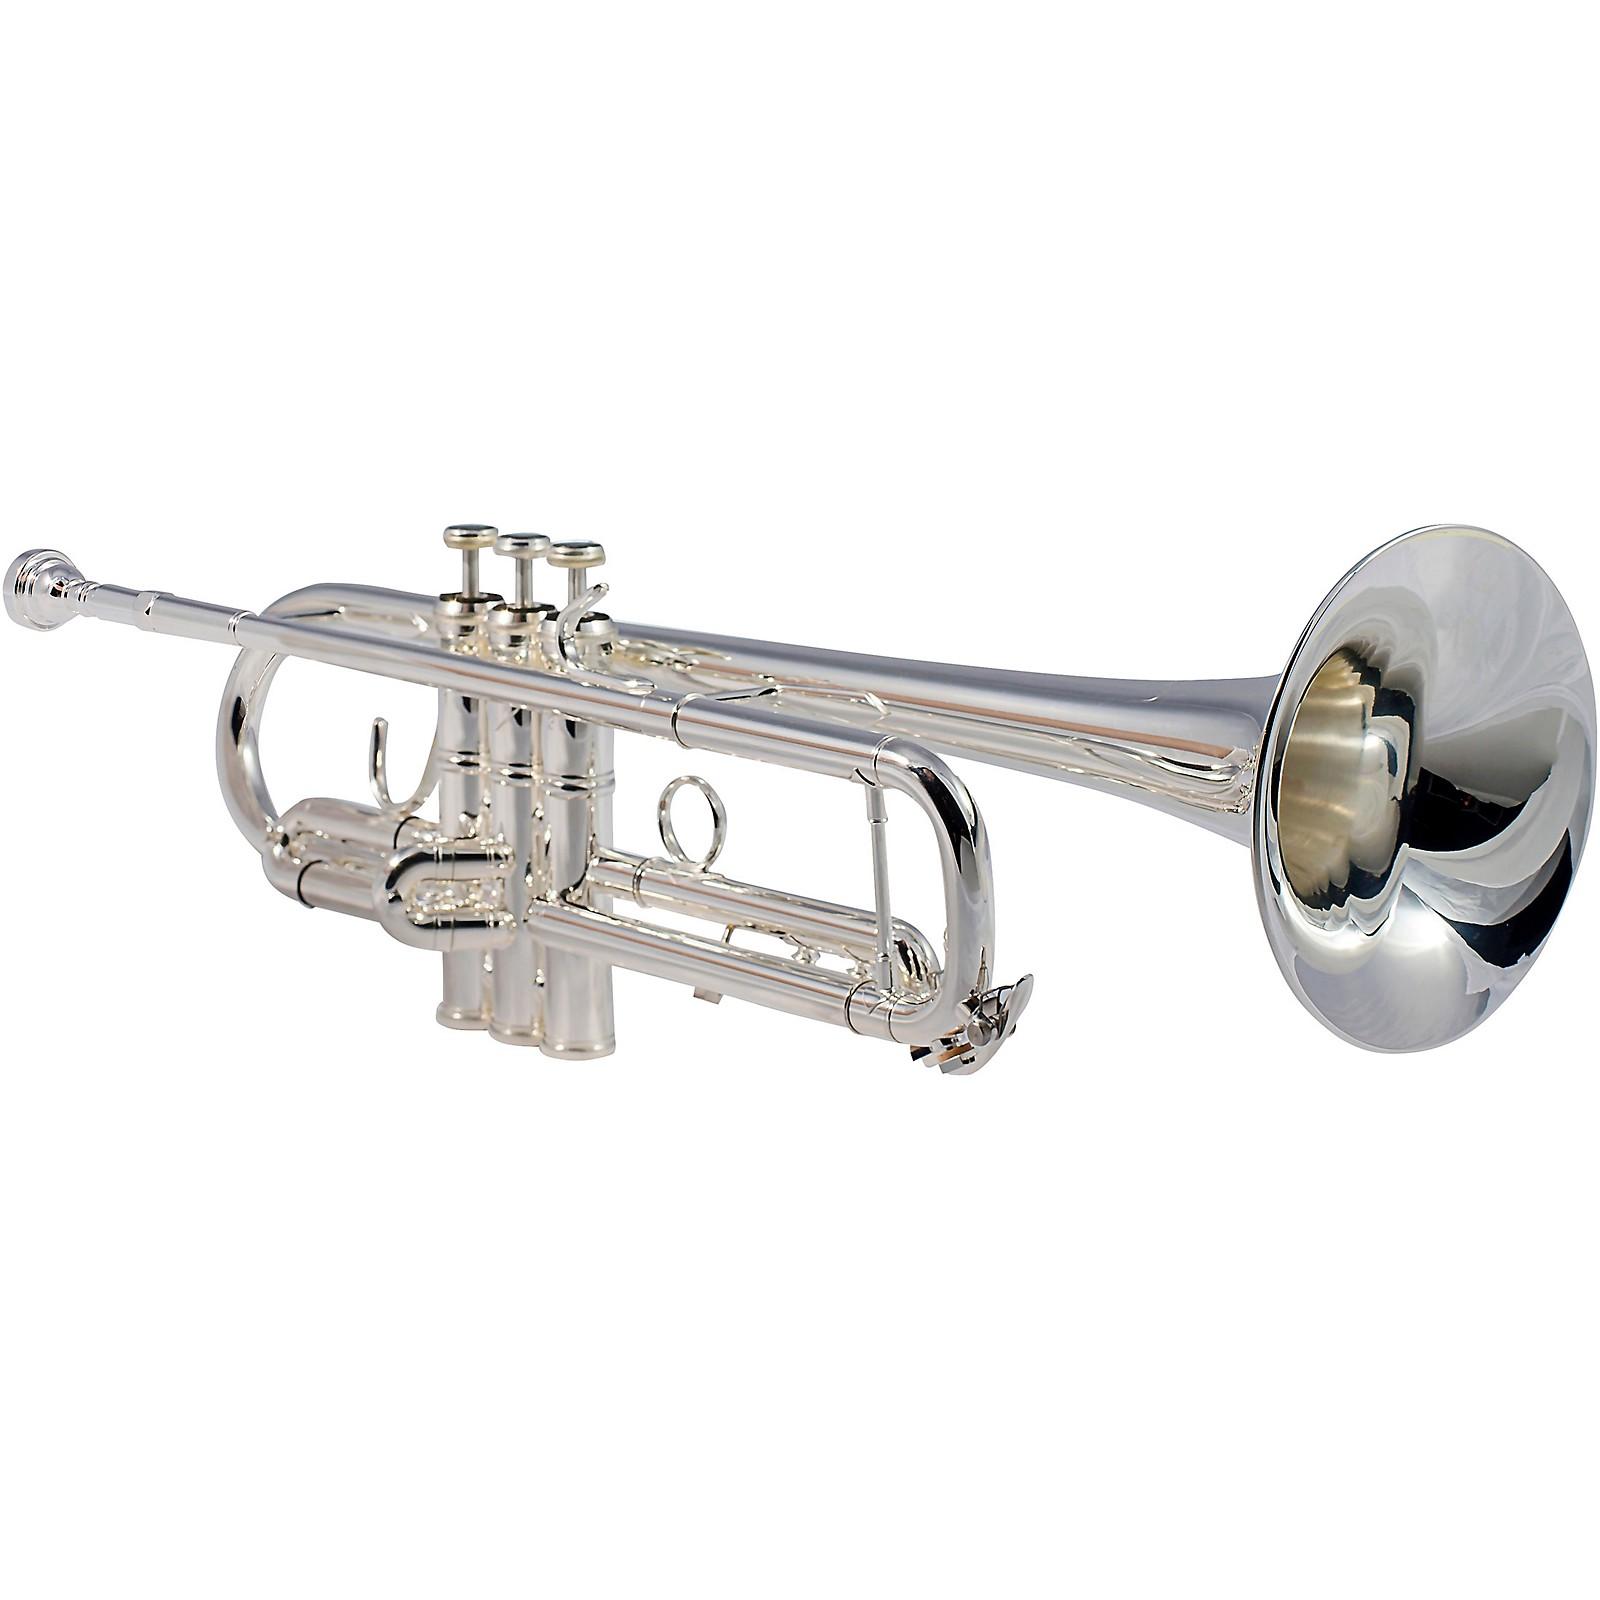 Allora ATR-580 Chicago Series Professional Bb Trumpet